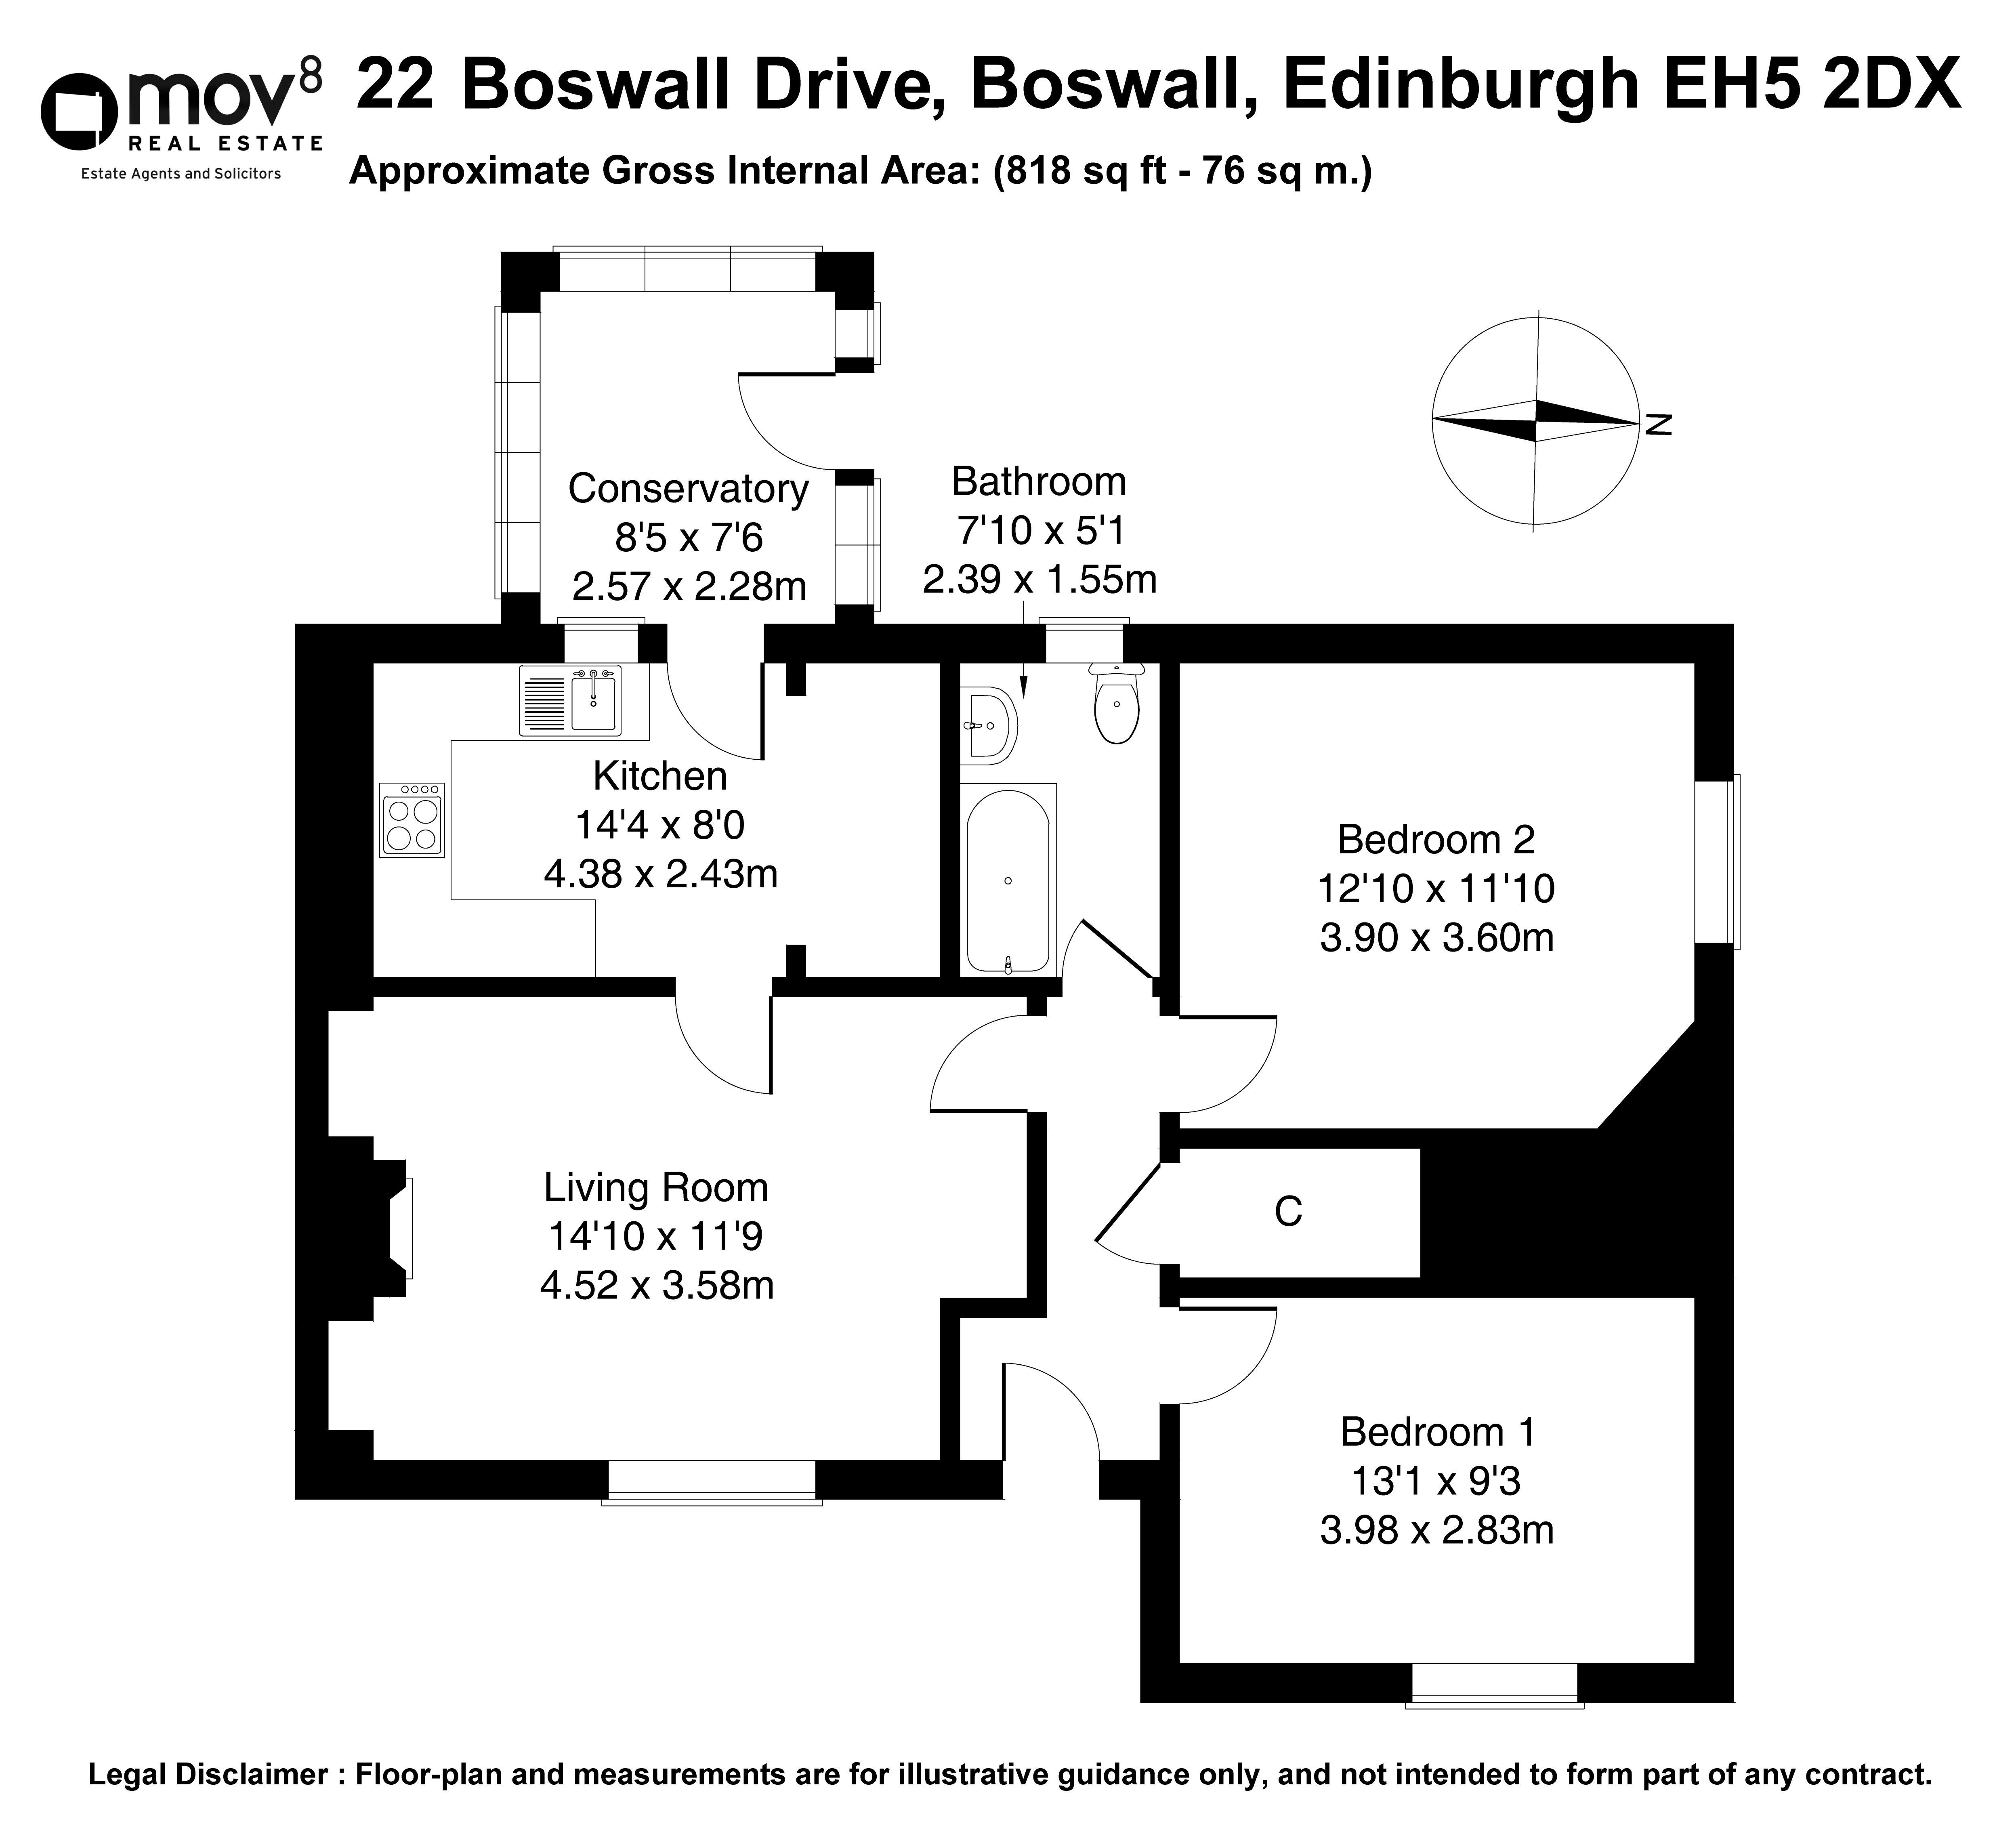 Floorplan 1 of 22 Boswall Drive, Boswall, Edinburgh, EH5 2DX